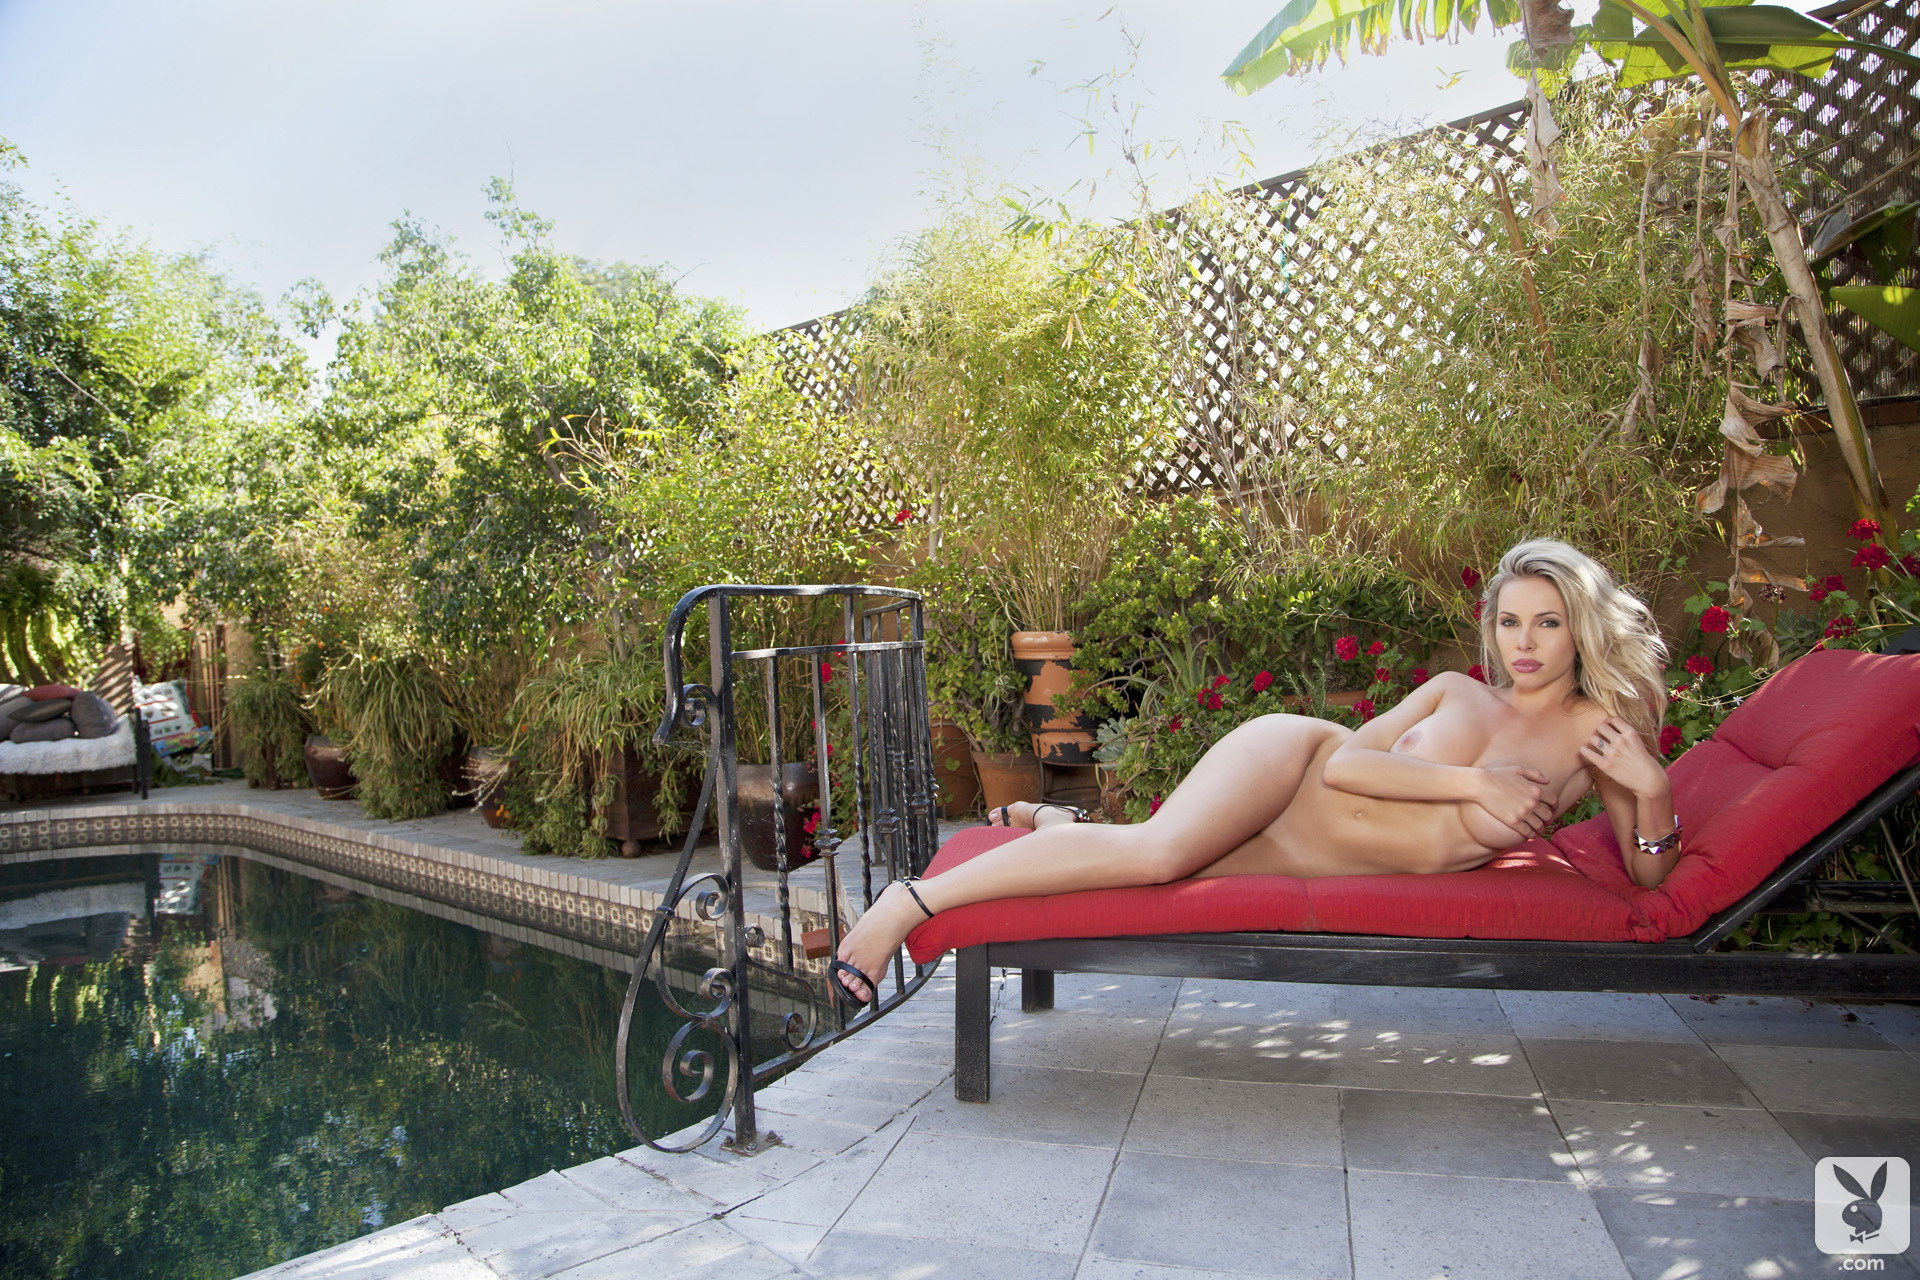 devin-justine-poolside-bikini-playboy-11